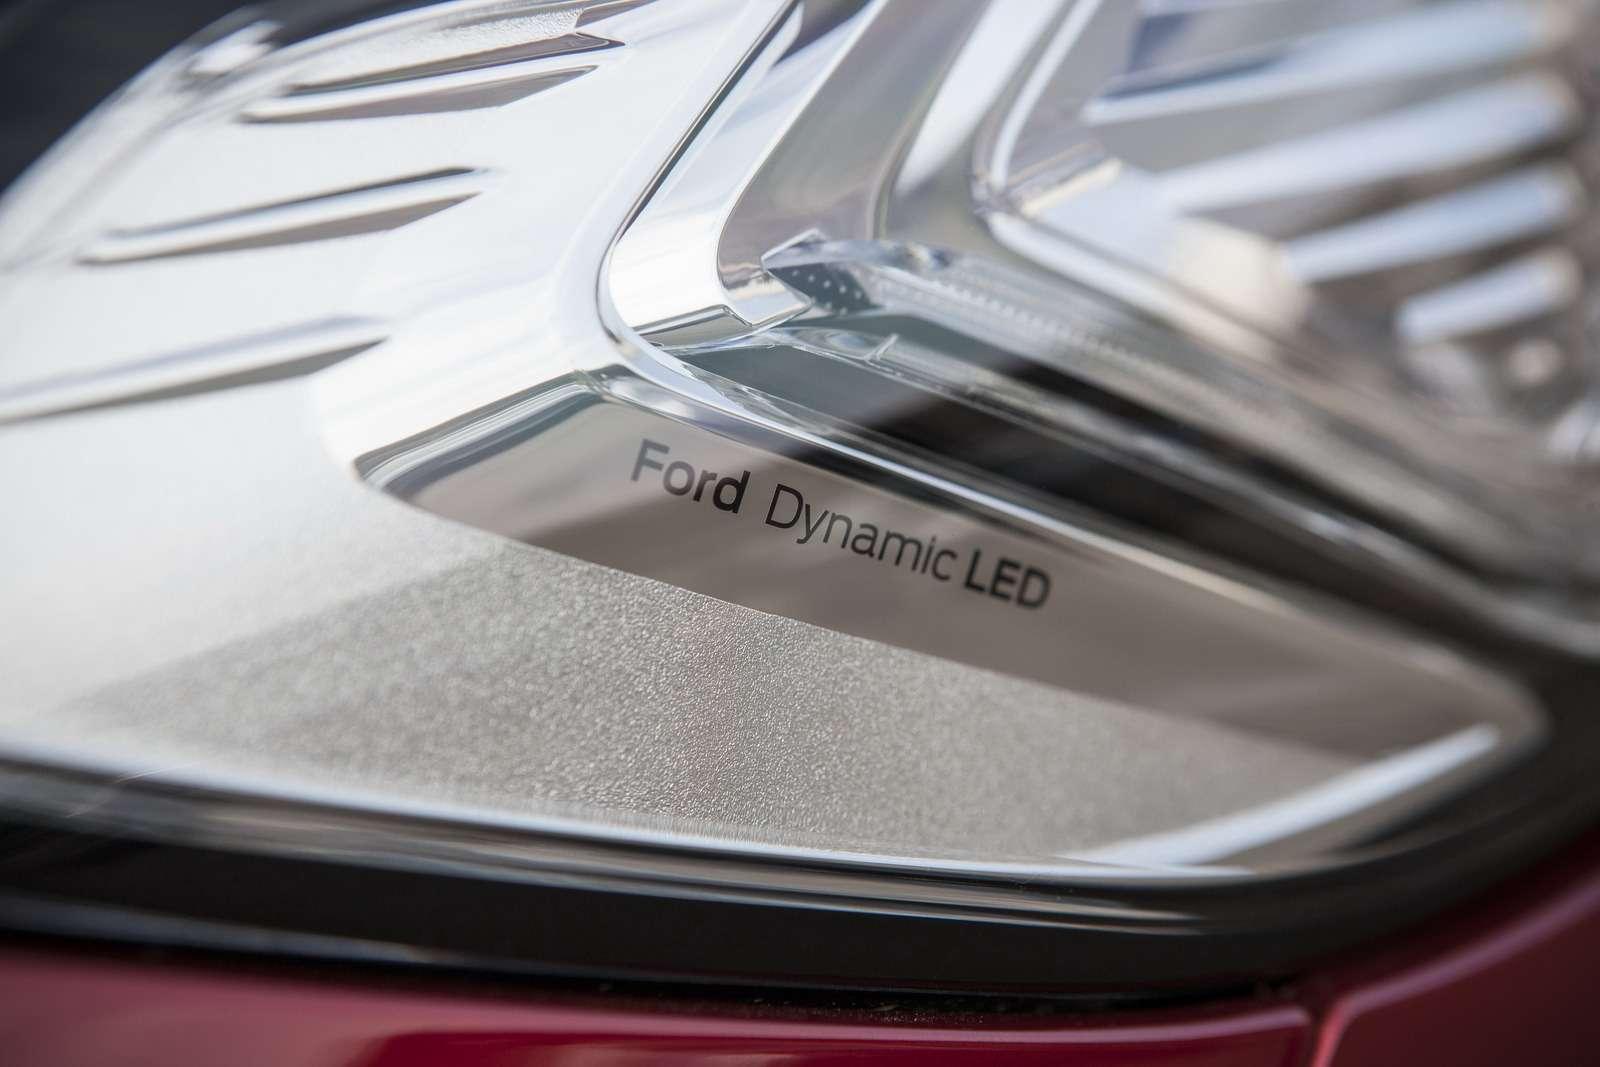 FordMondeo-5Door_20_новый размер